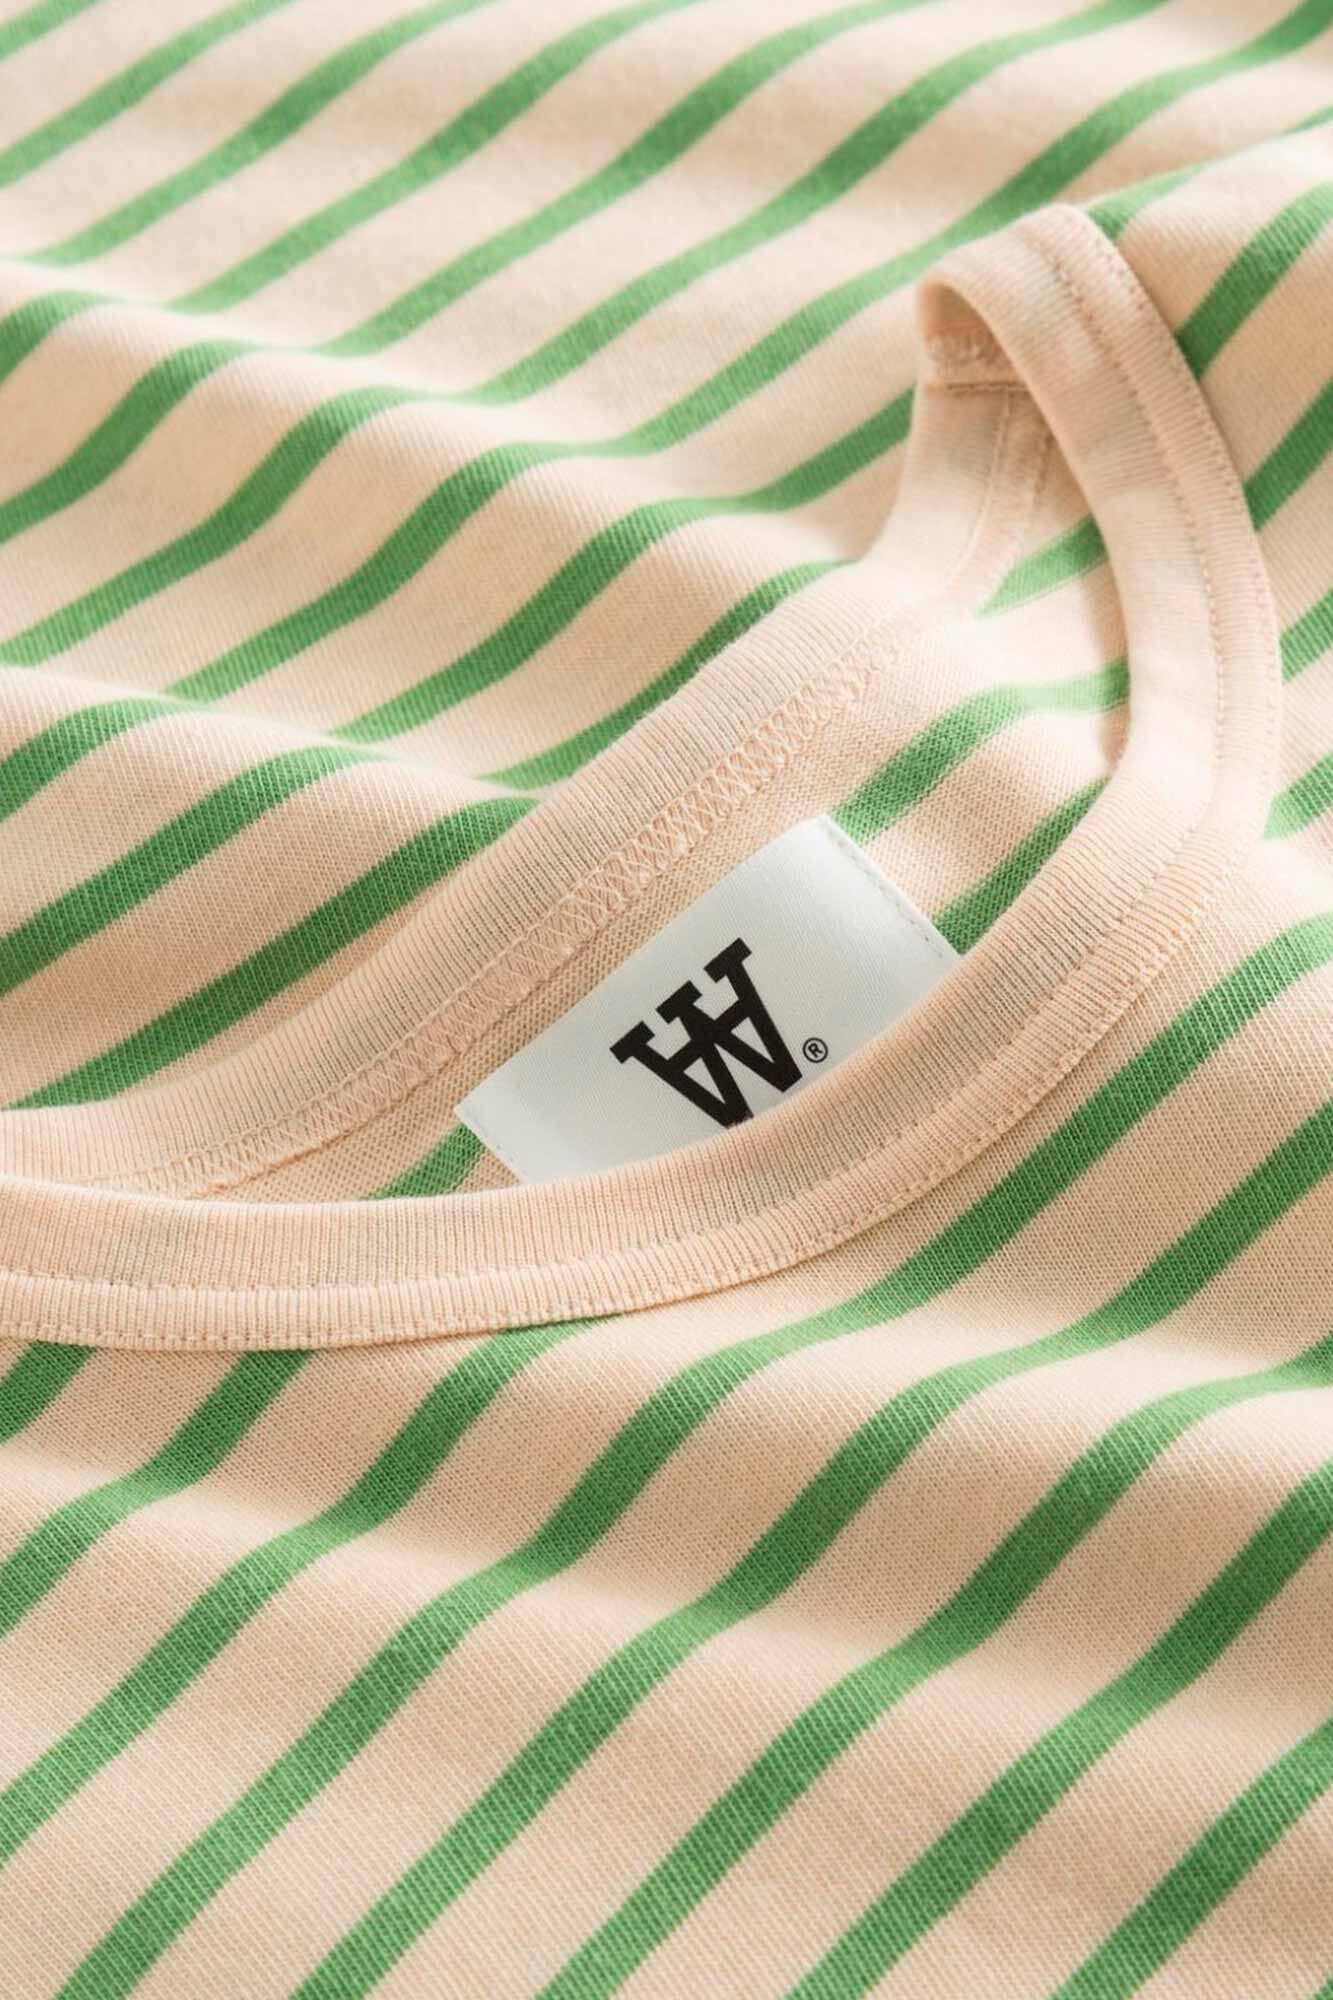 Moa long sleeve 10921500-2323, OFF-WHITE/GREEN STRIPES